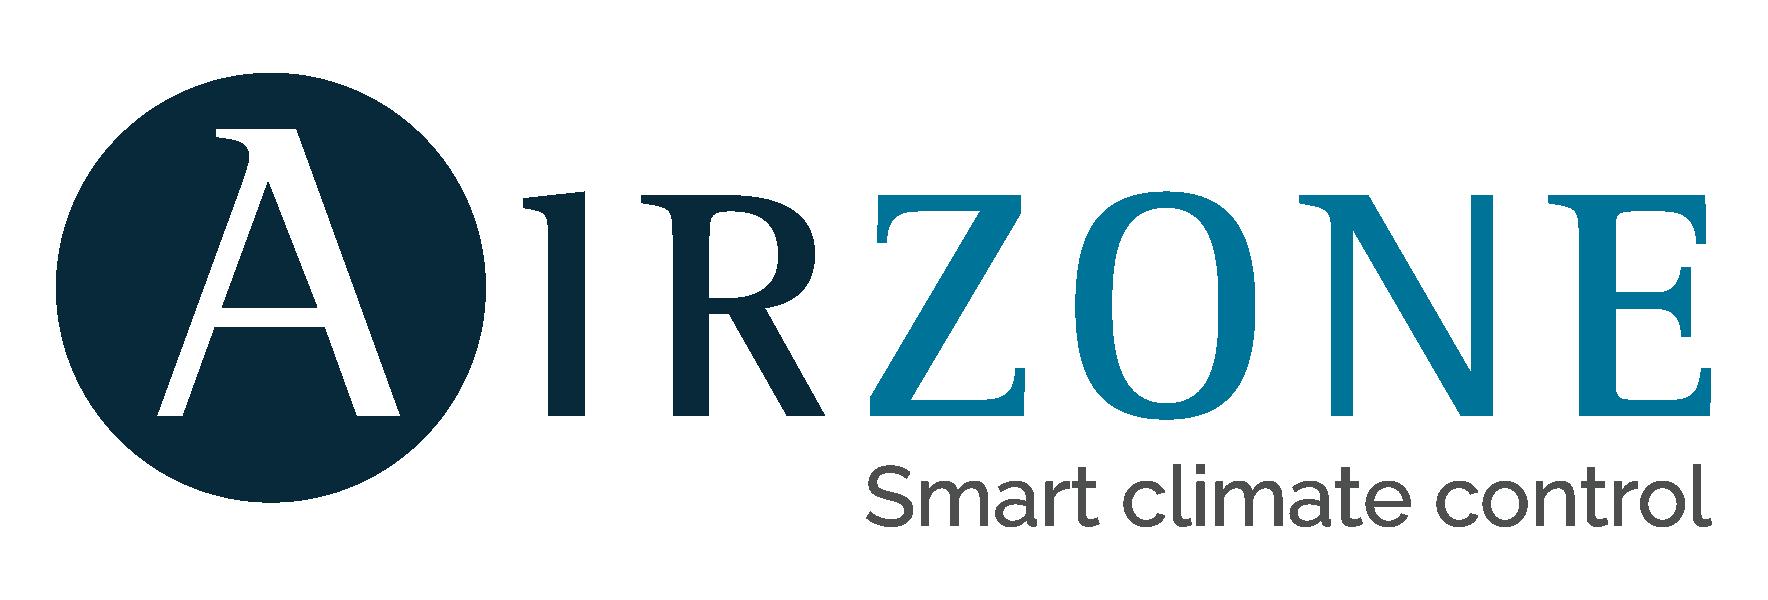 airzone_logo_original_background_white